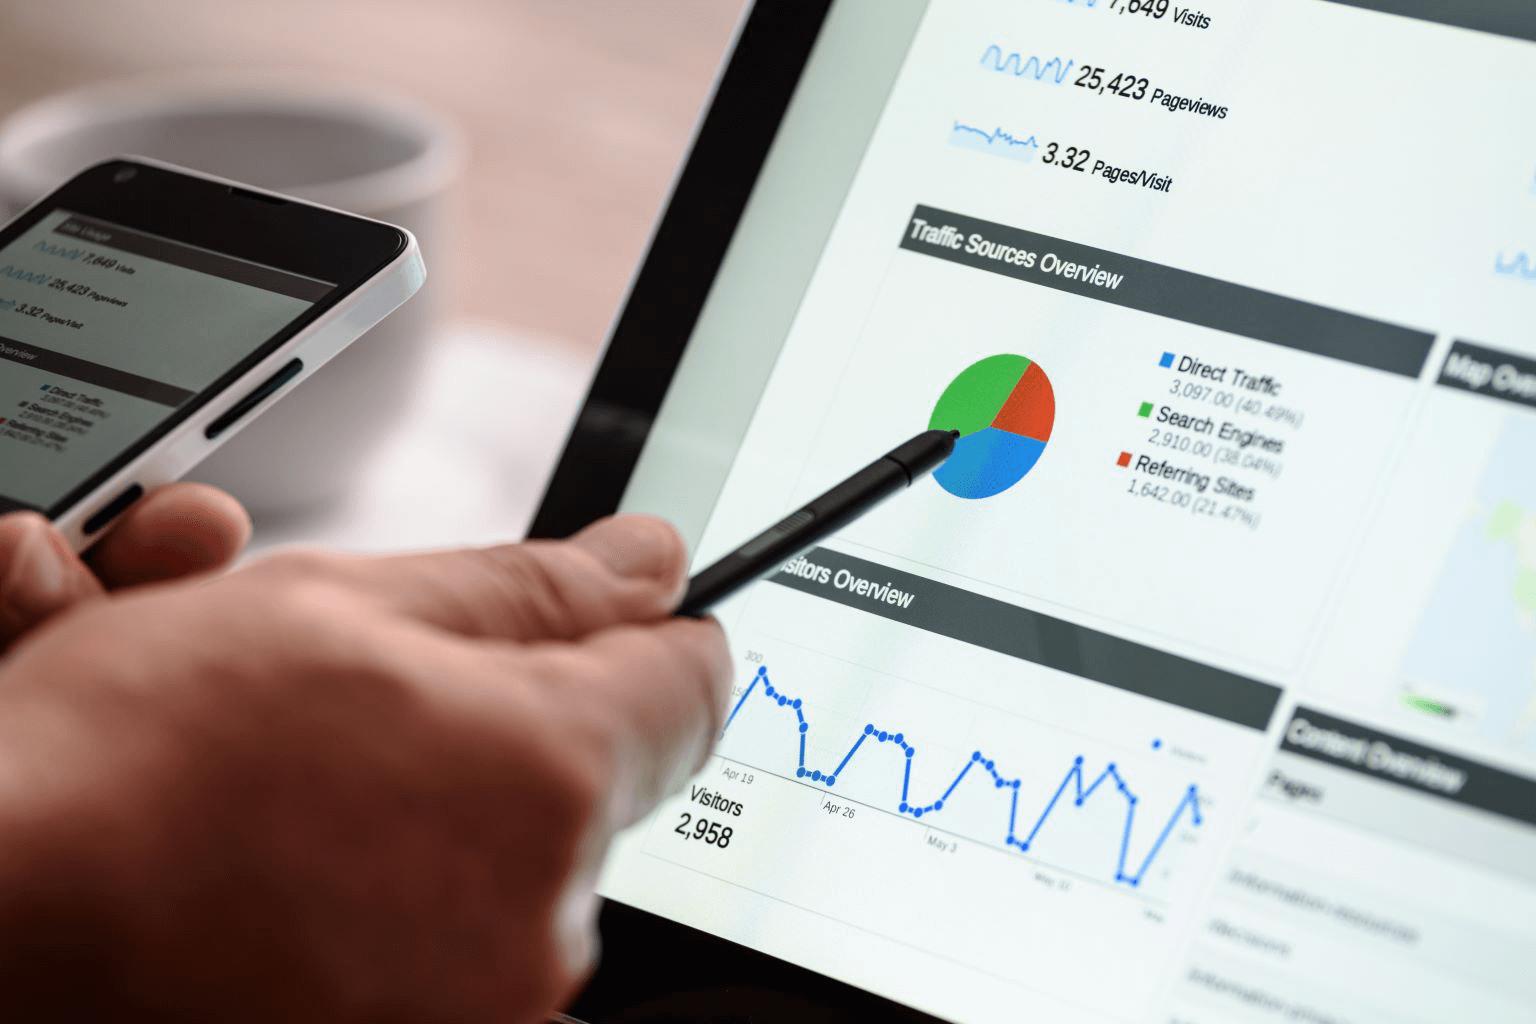 Case datagedreven marketing | PDCA cyclus | PDCA principe